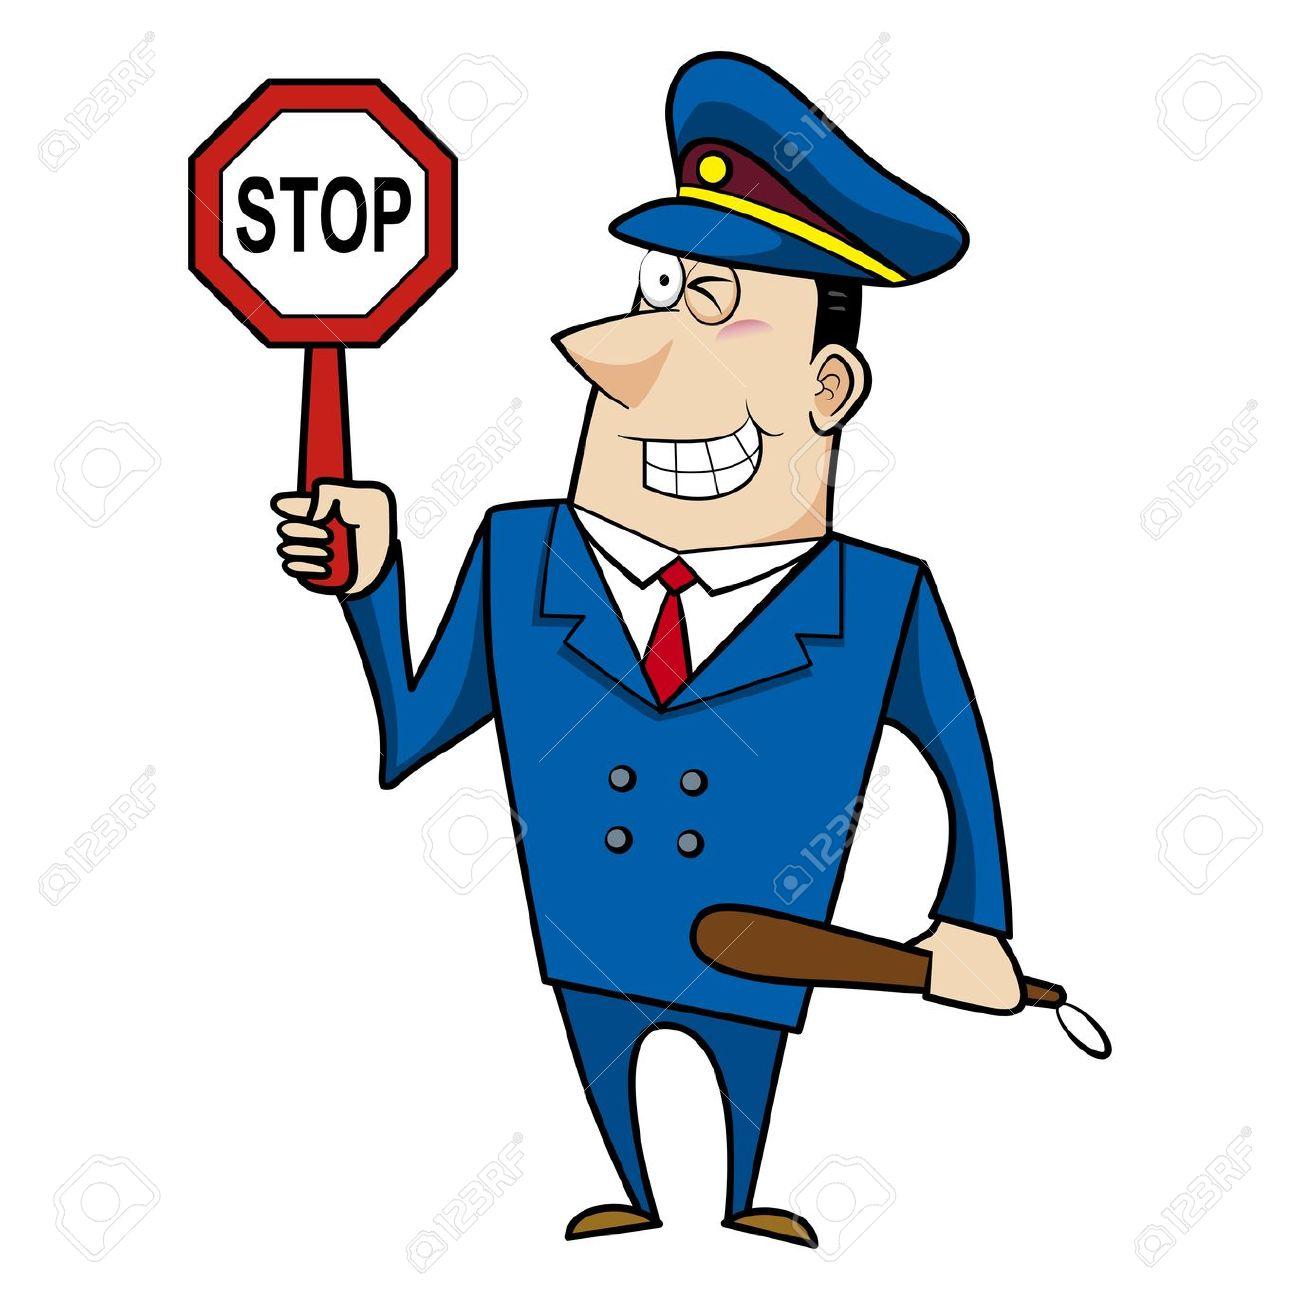 traffic-police-clipart-7.jpg